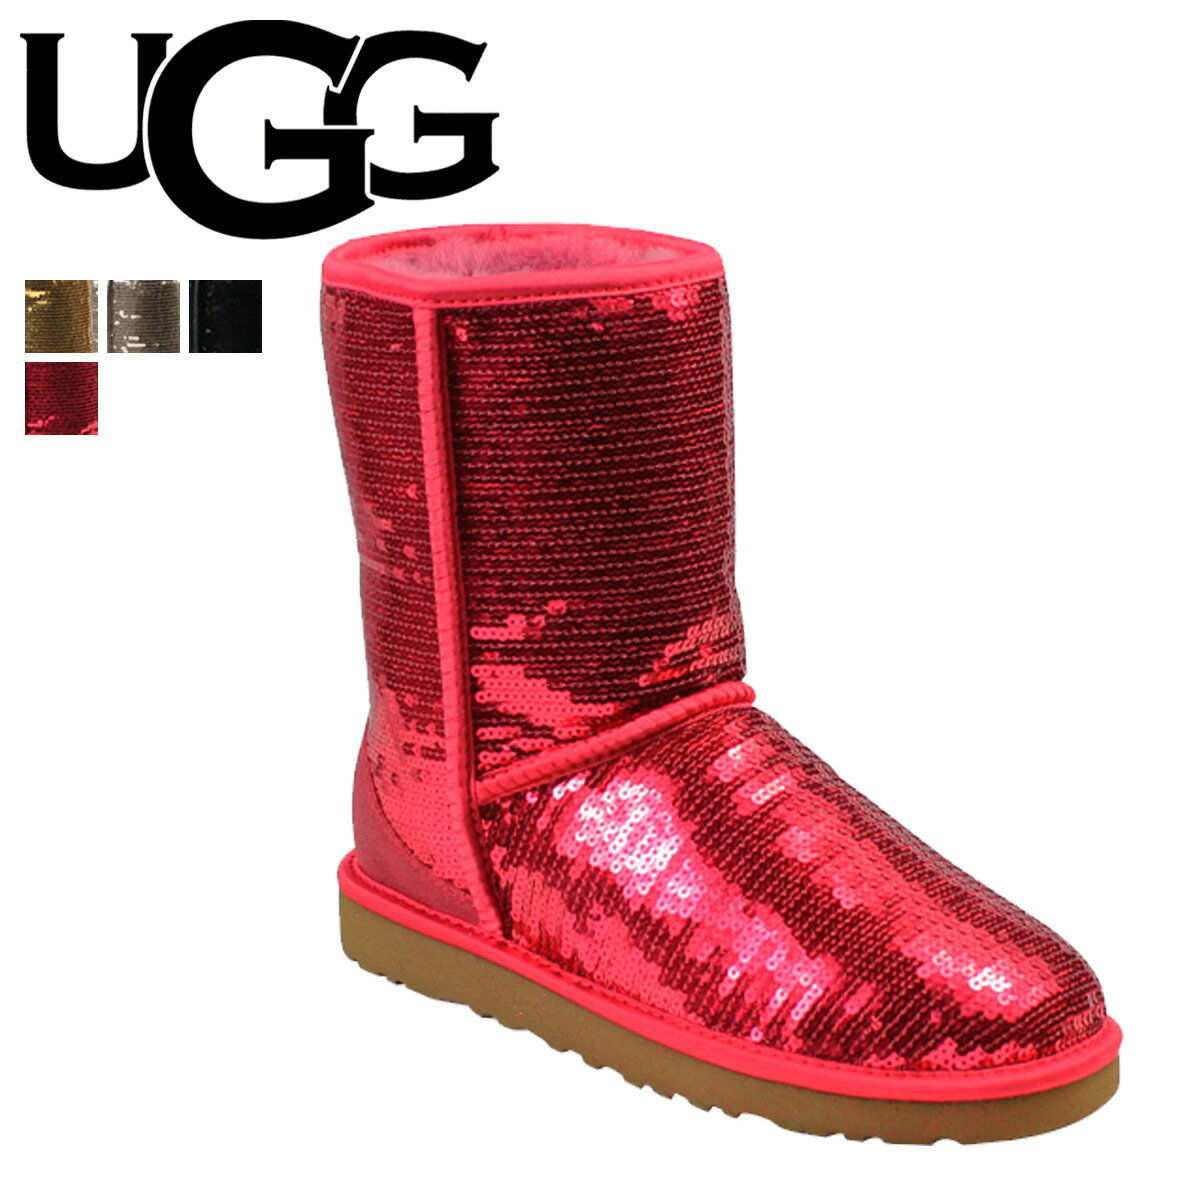 allsports ugg ugg women s classic short sparkles in 5 color womens rh global rakuten com